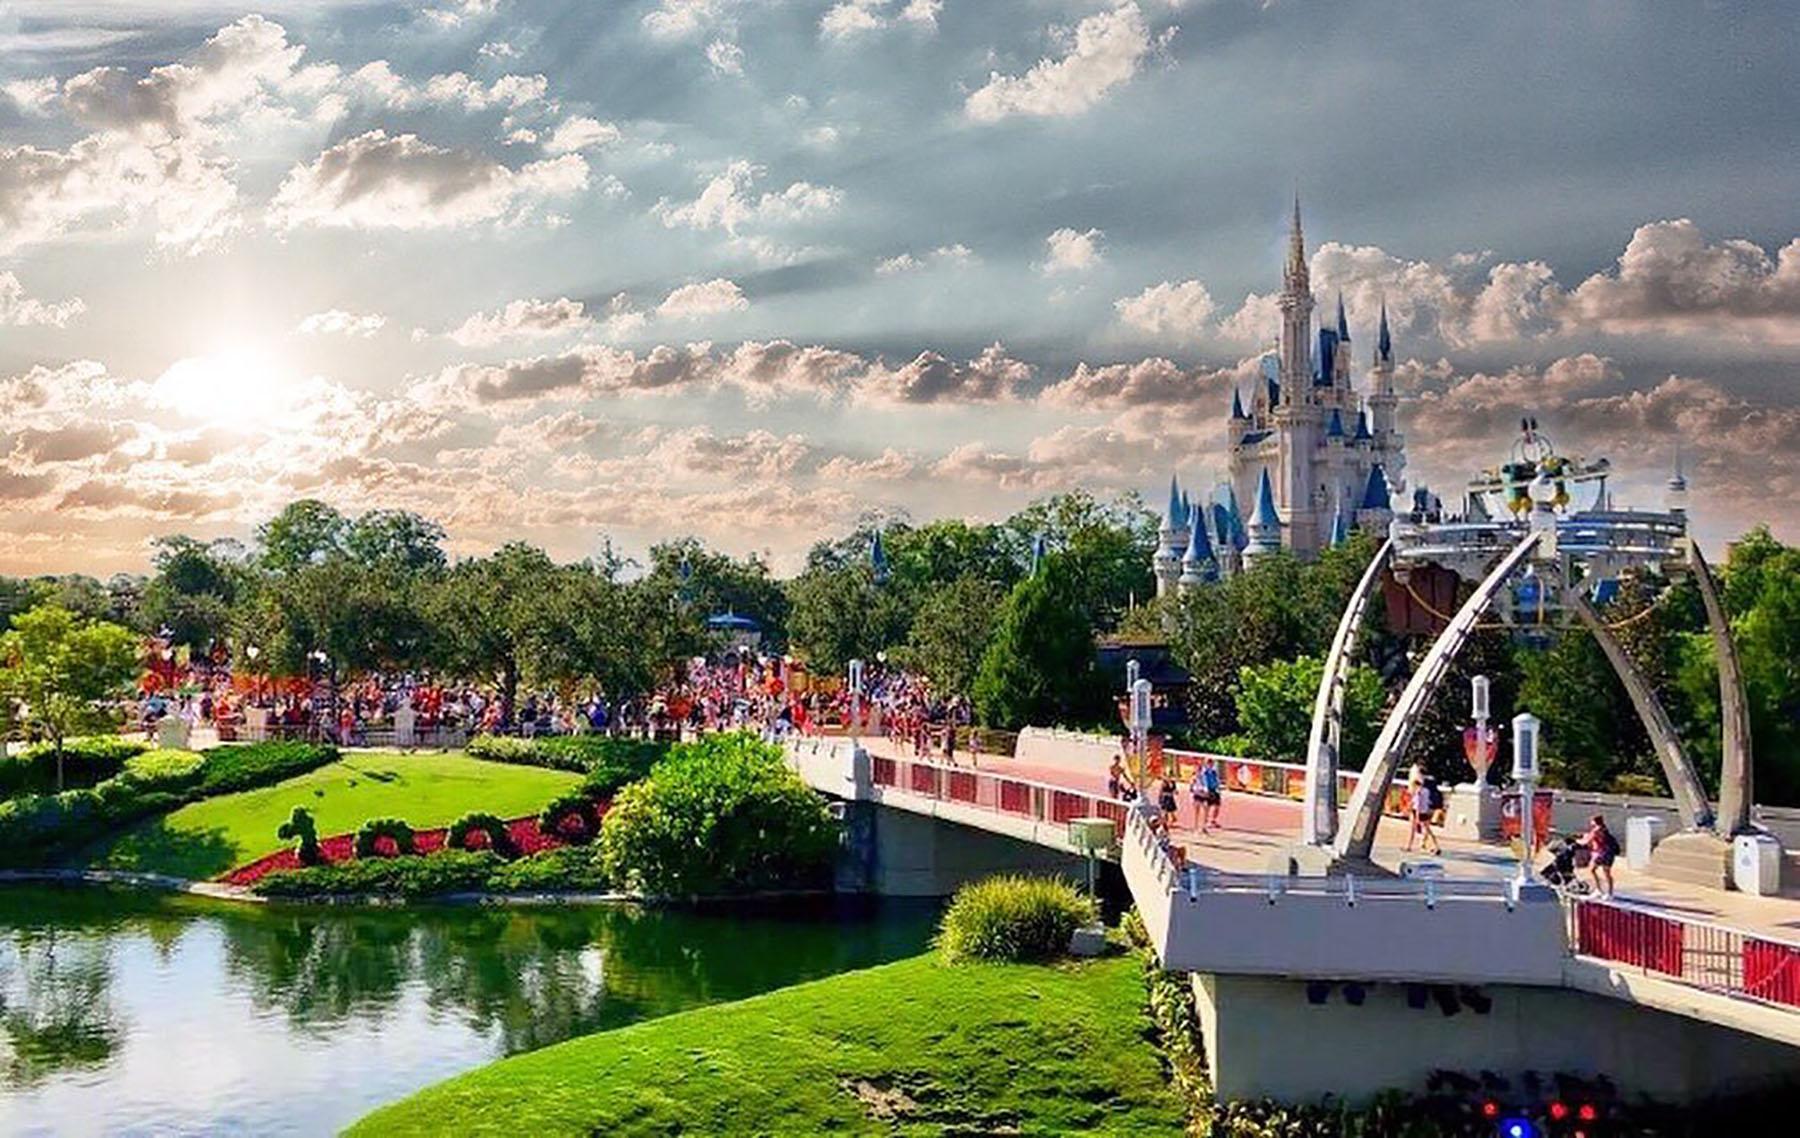 The Magic Kingdom near Kissimmee, Florida